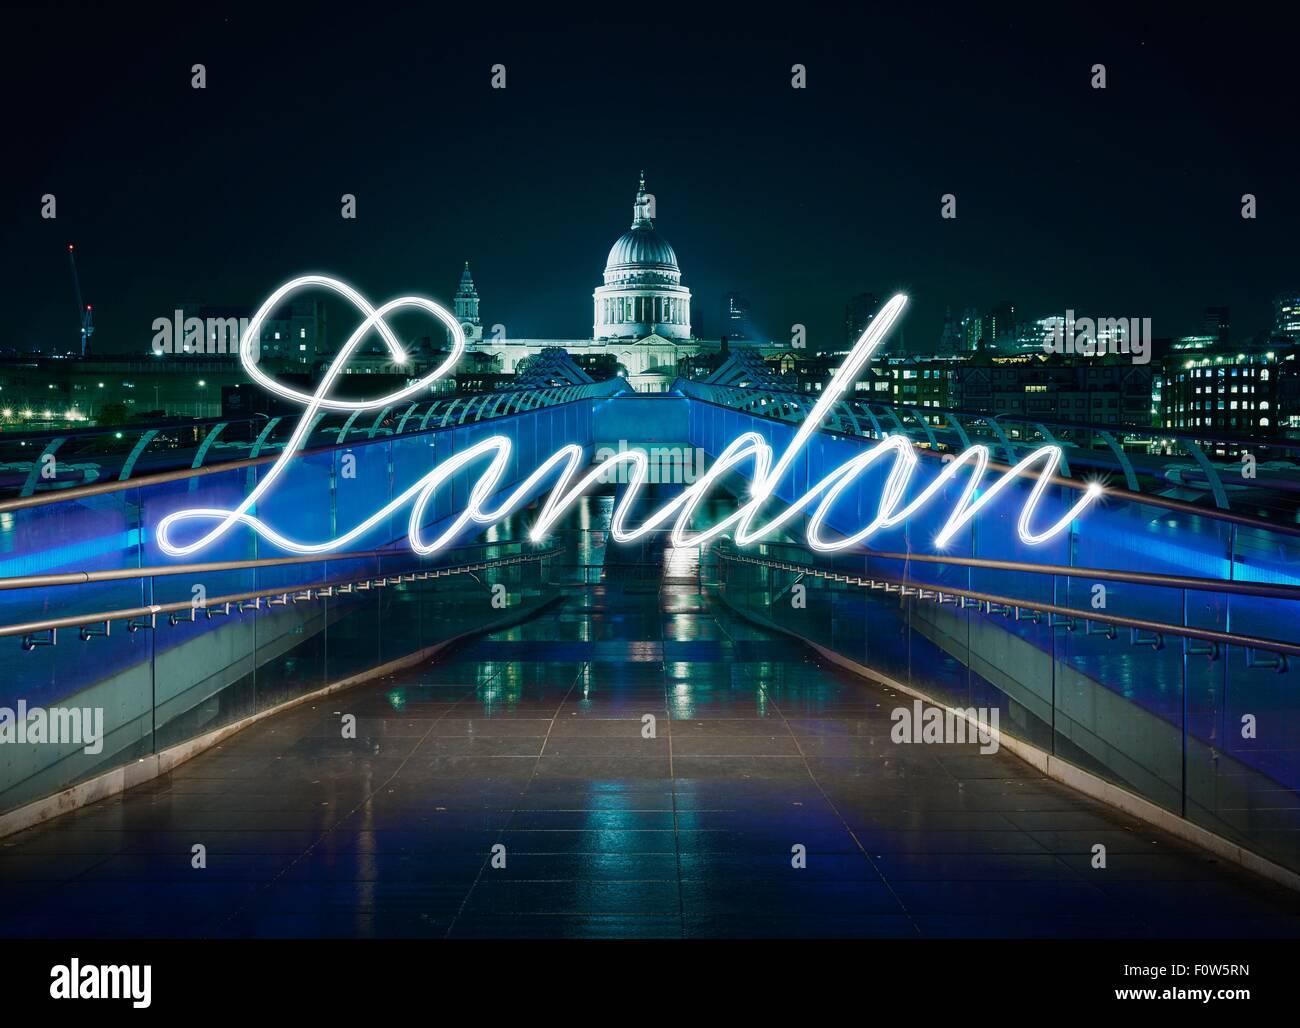 Glowing handwritten London in front of Millennium bridge at night, London, UK - Stock Image